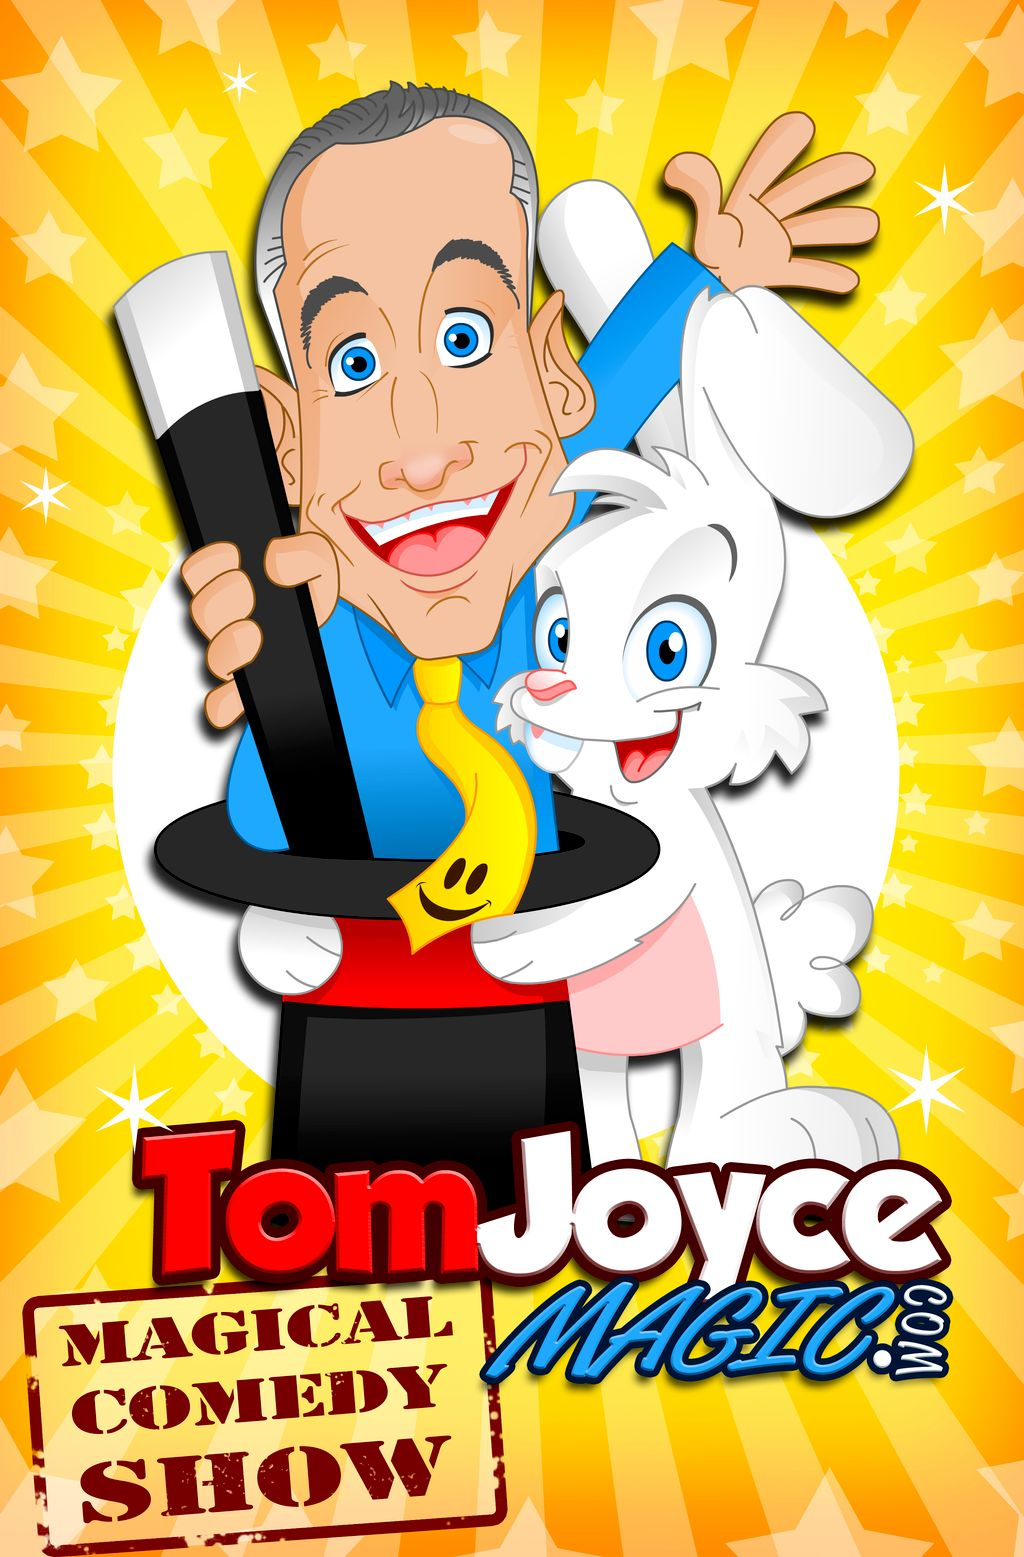 Tom Joyce Magician